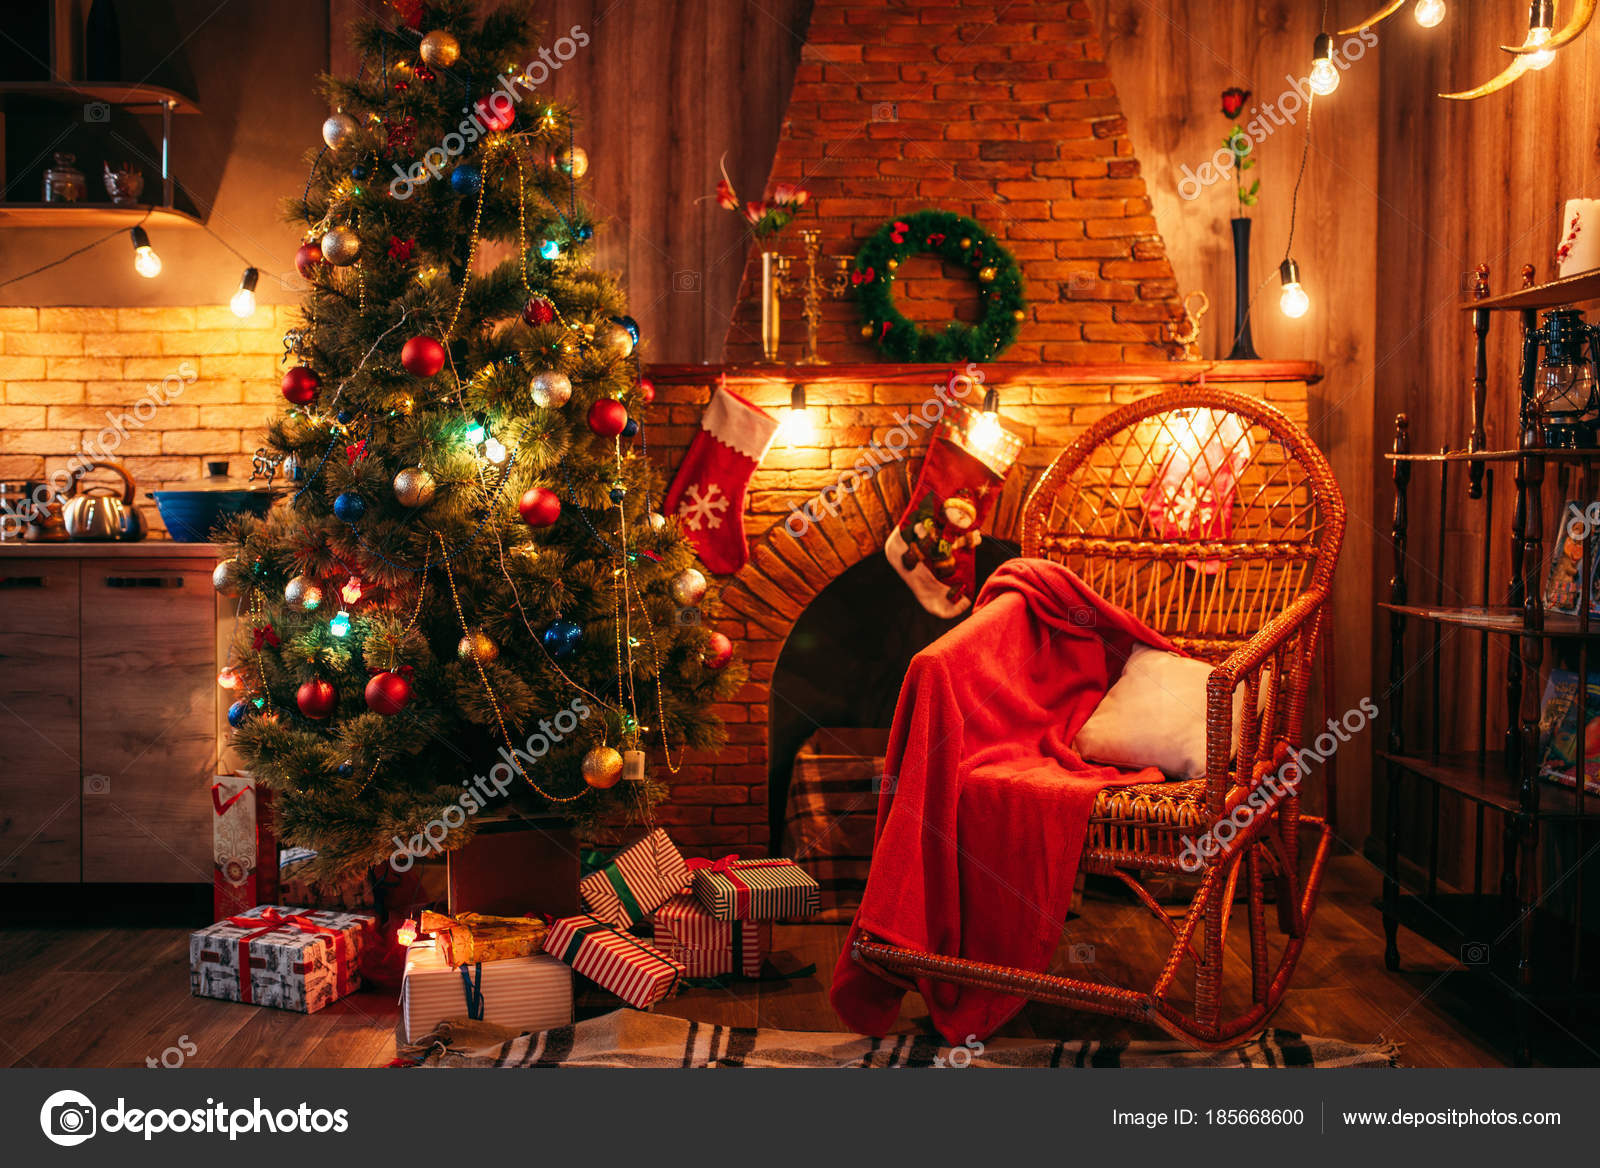 Christmas Tree Room Holiday Decorations Xmas Celebration